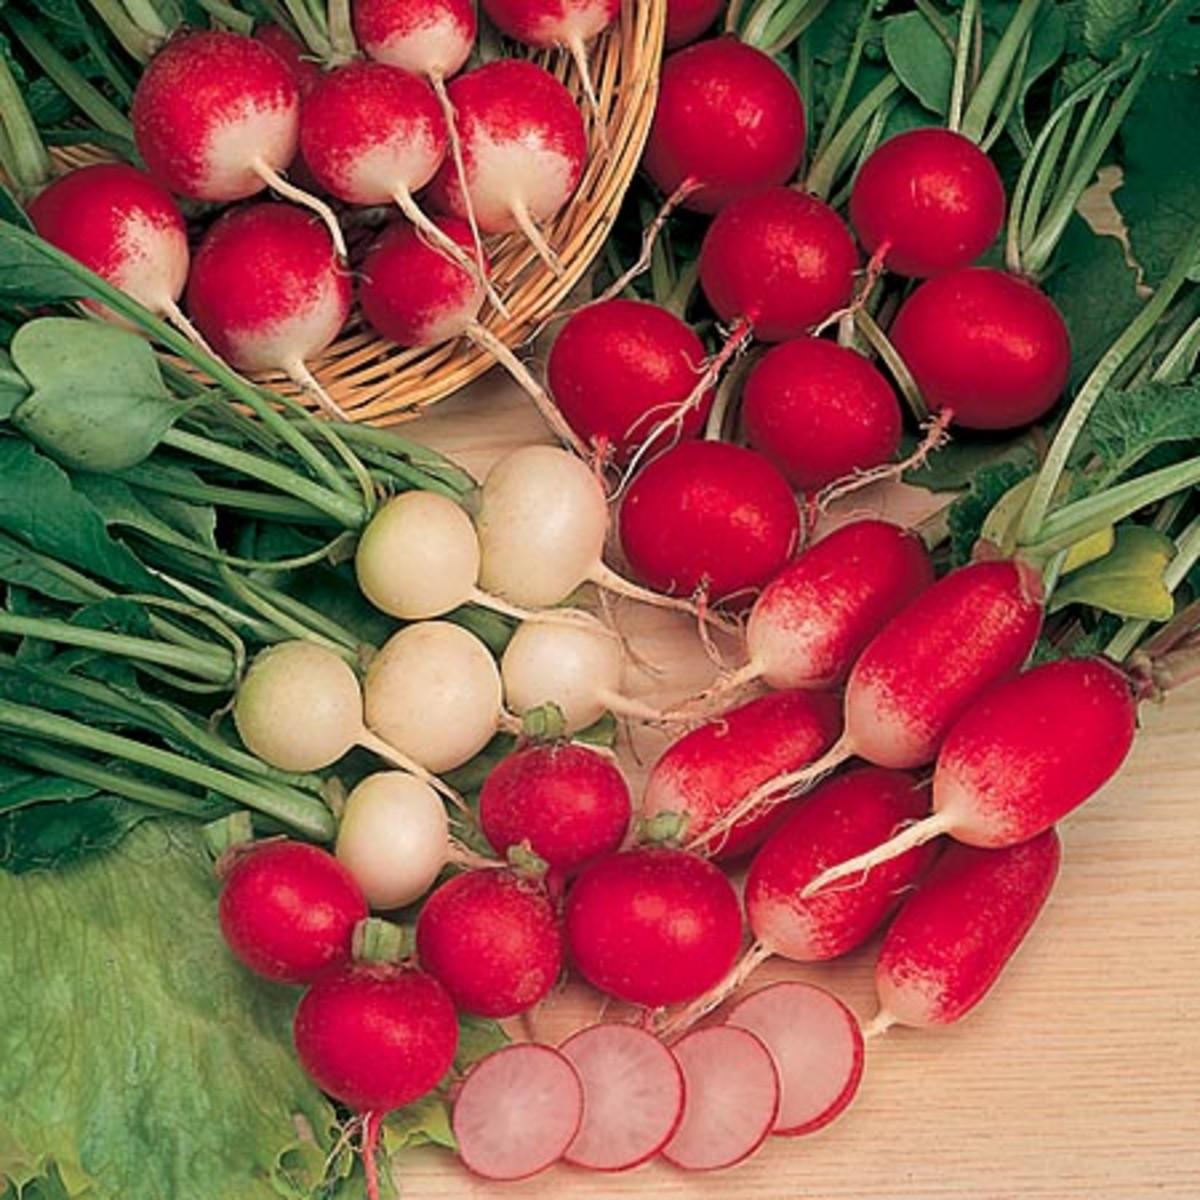 Radish red variety